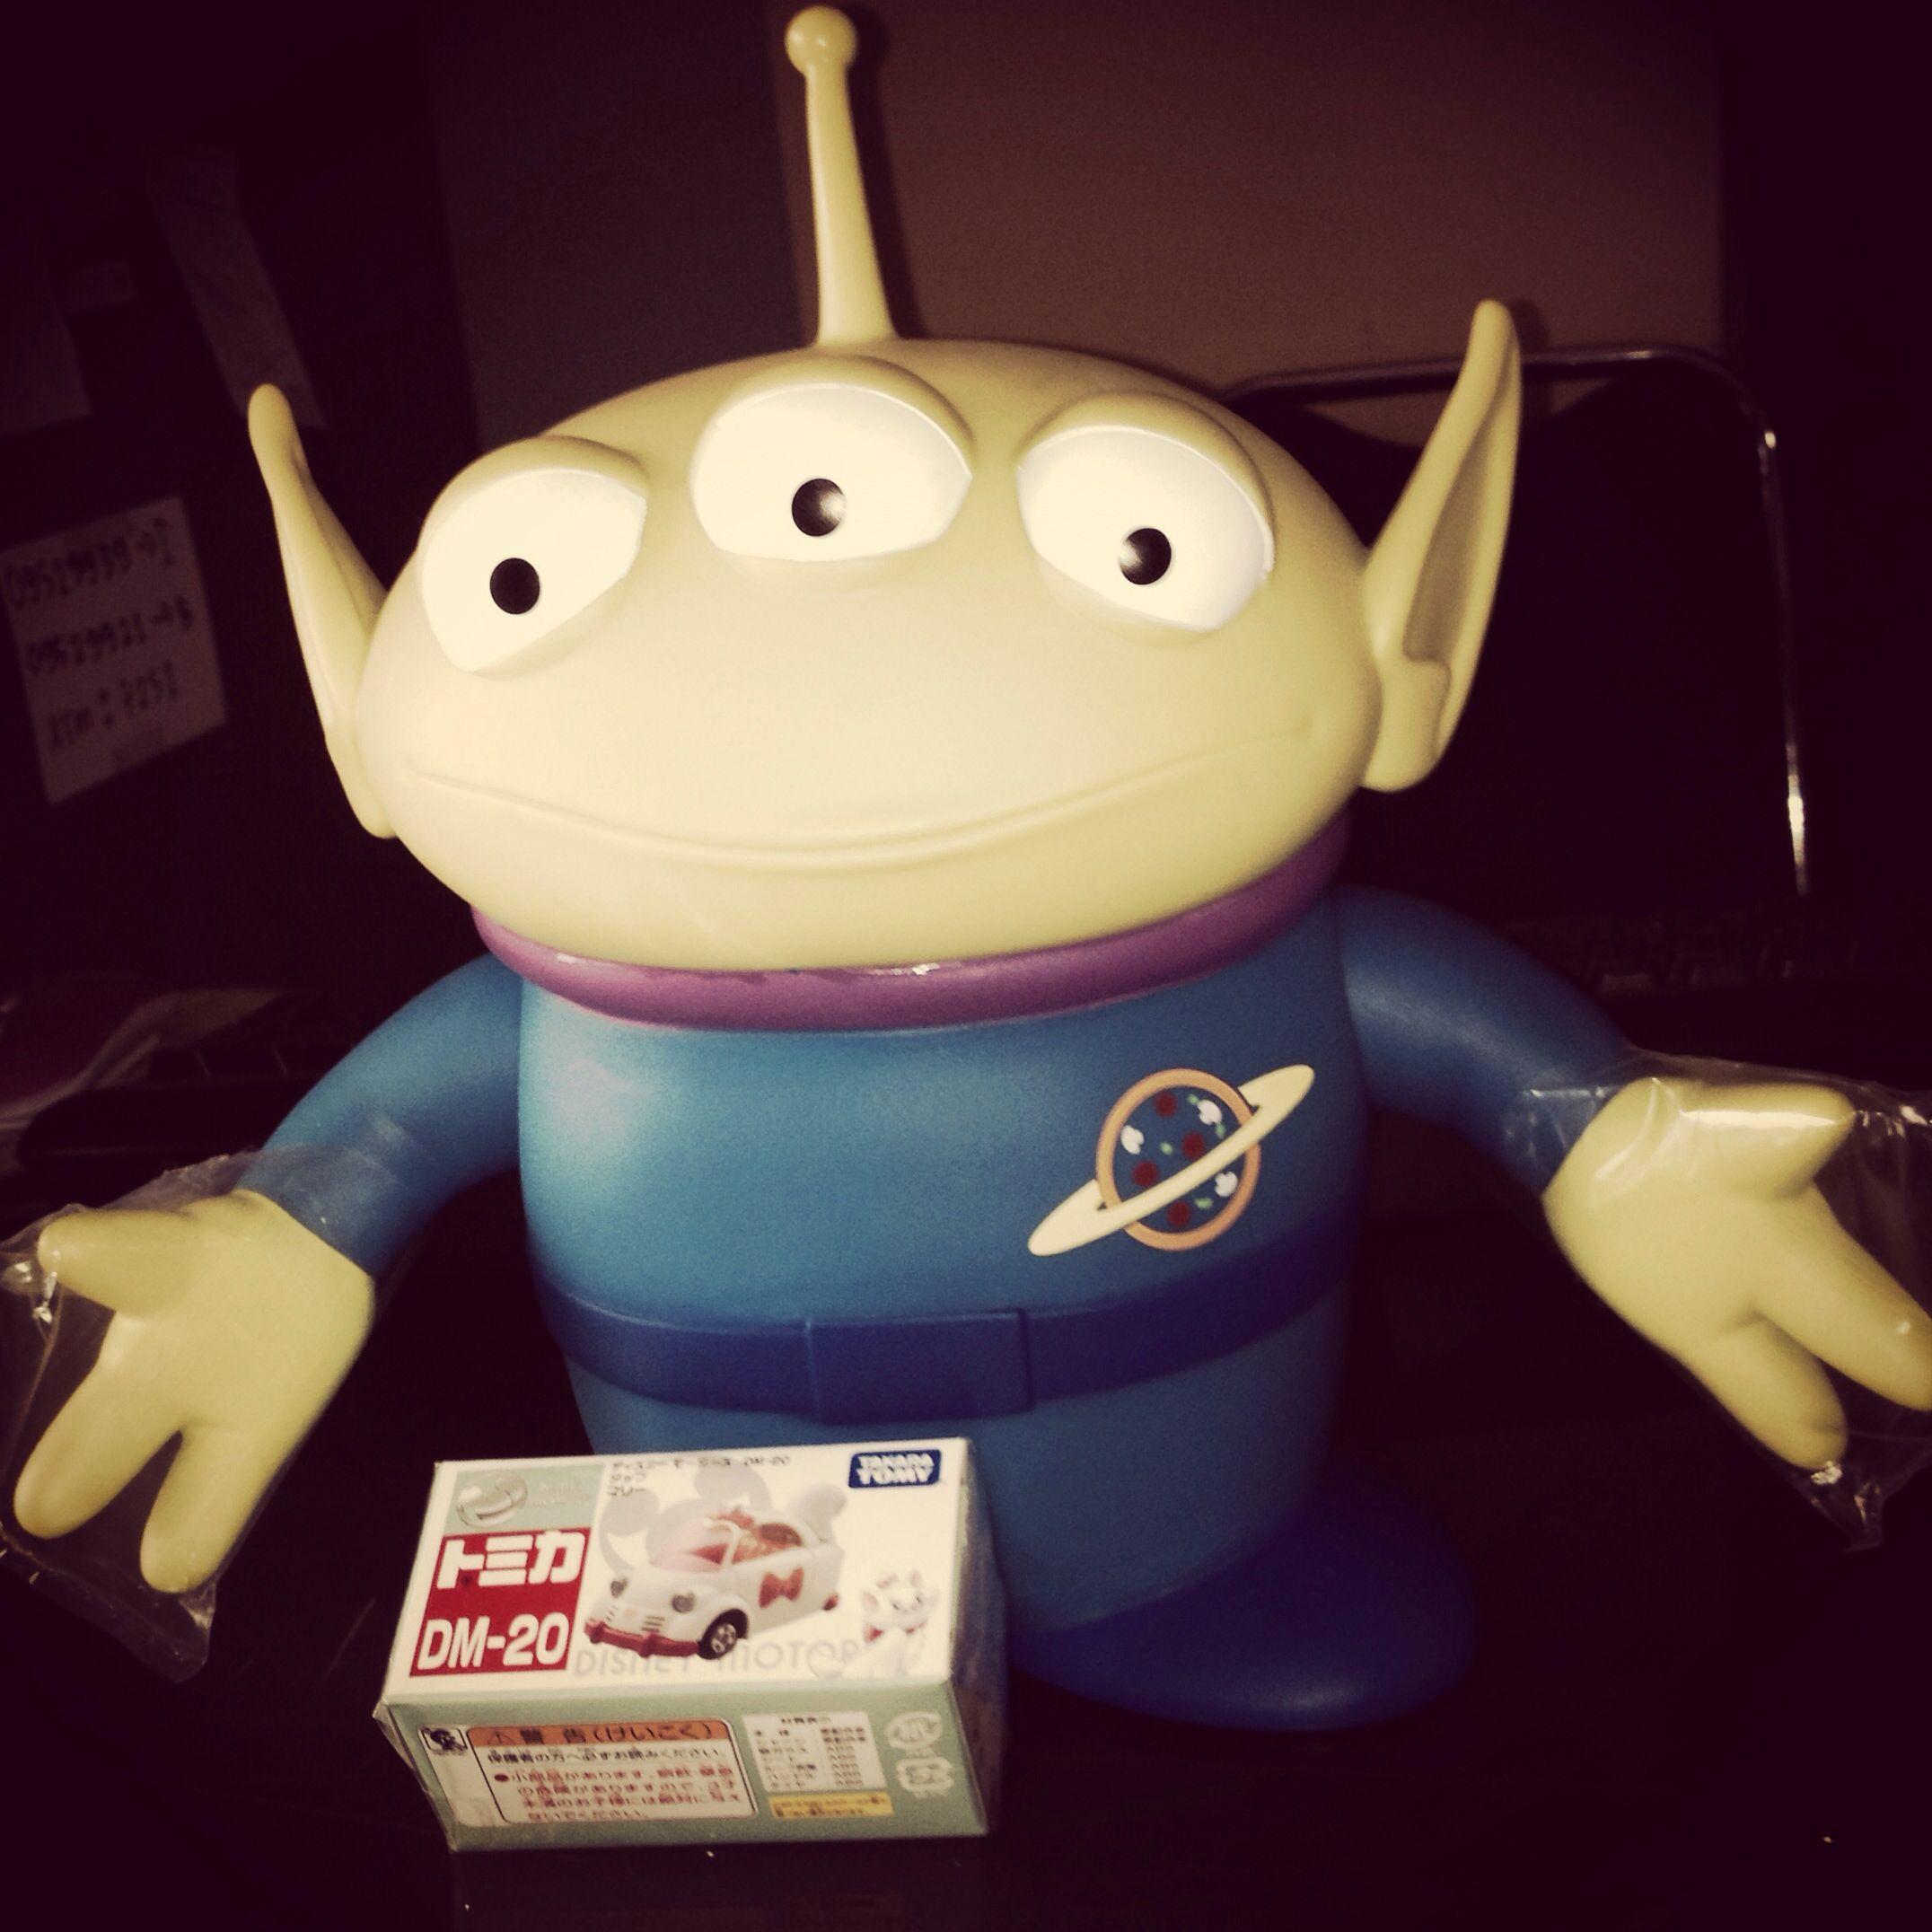 Aliens toystory figure | Toys | Pinterest